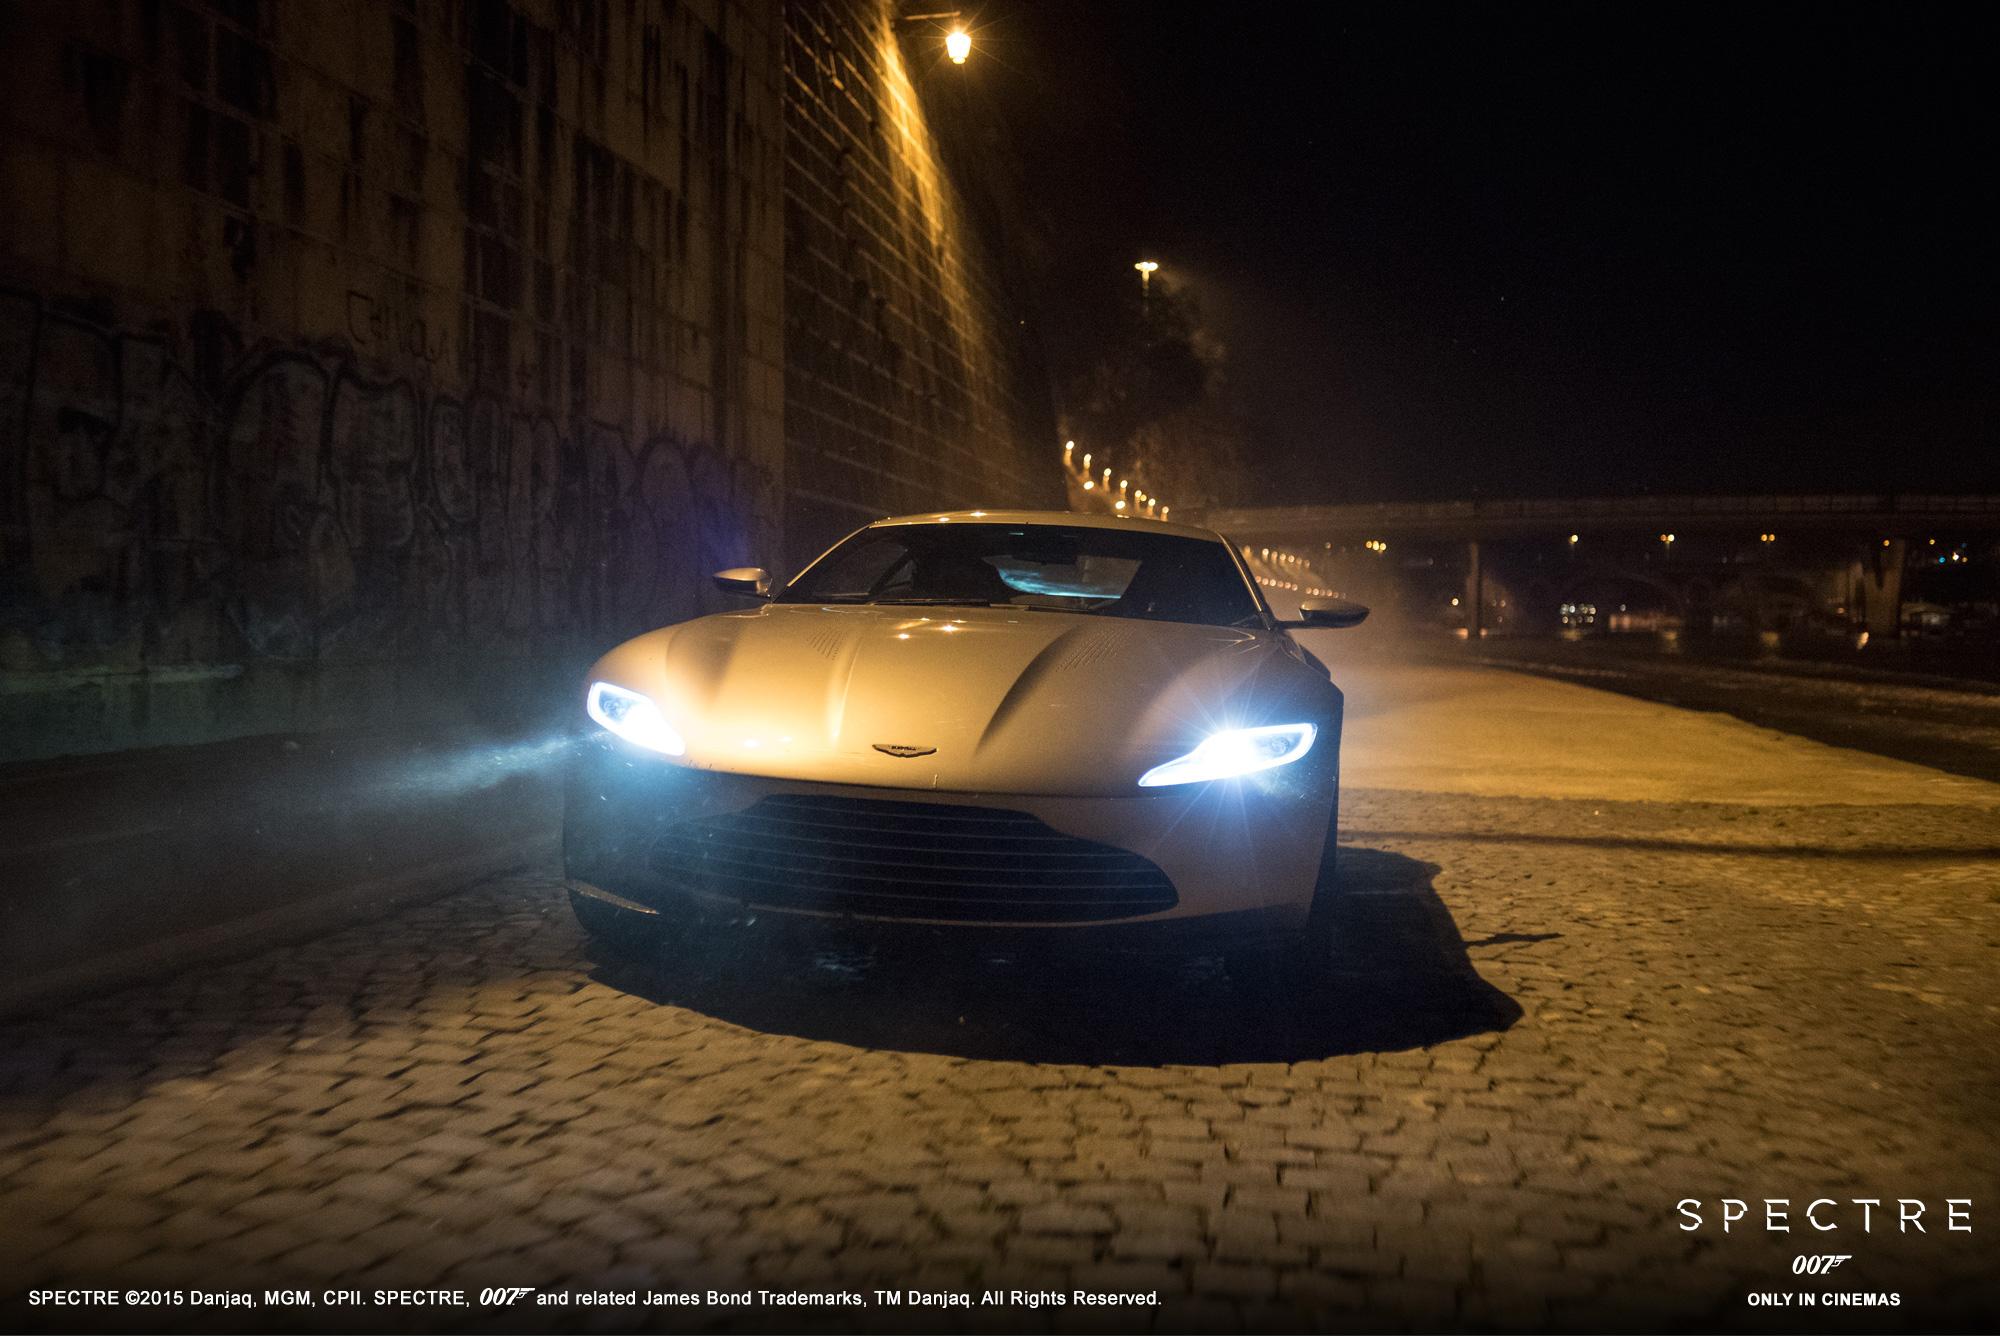 Aston Martin DB10 - Spectre 2015 - avant / front